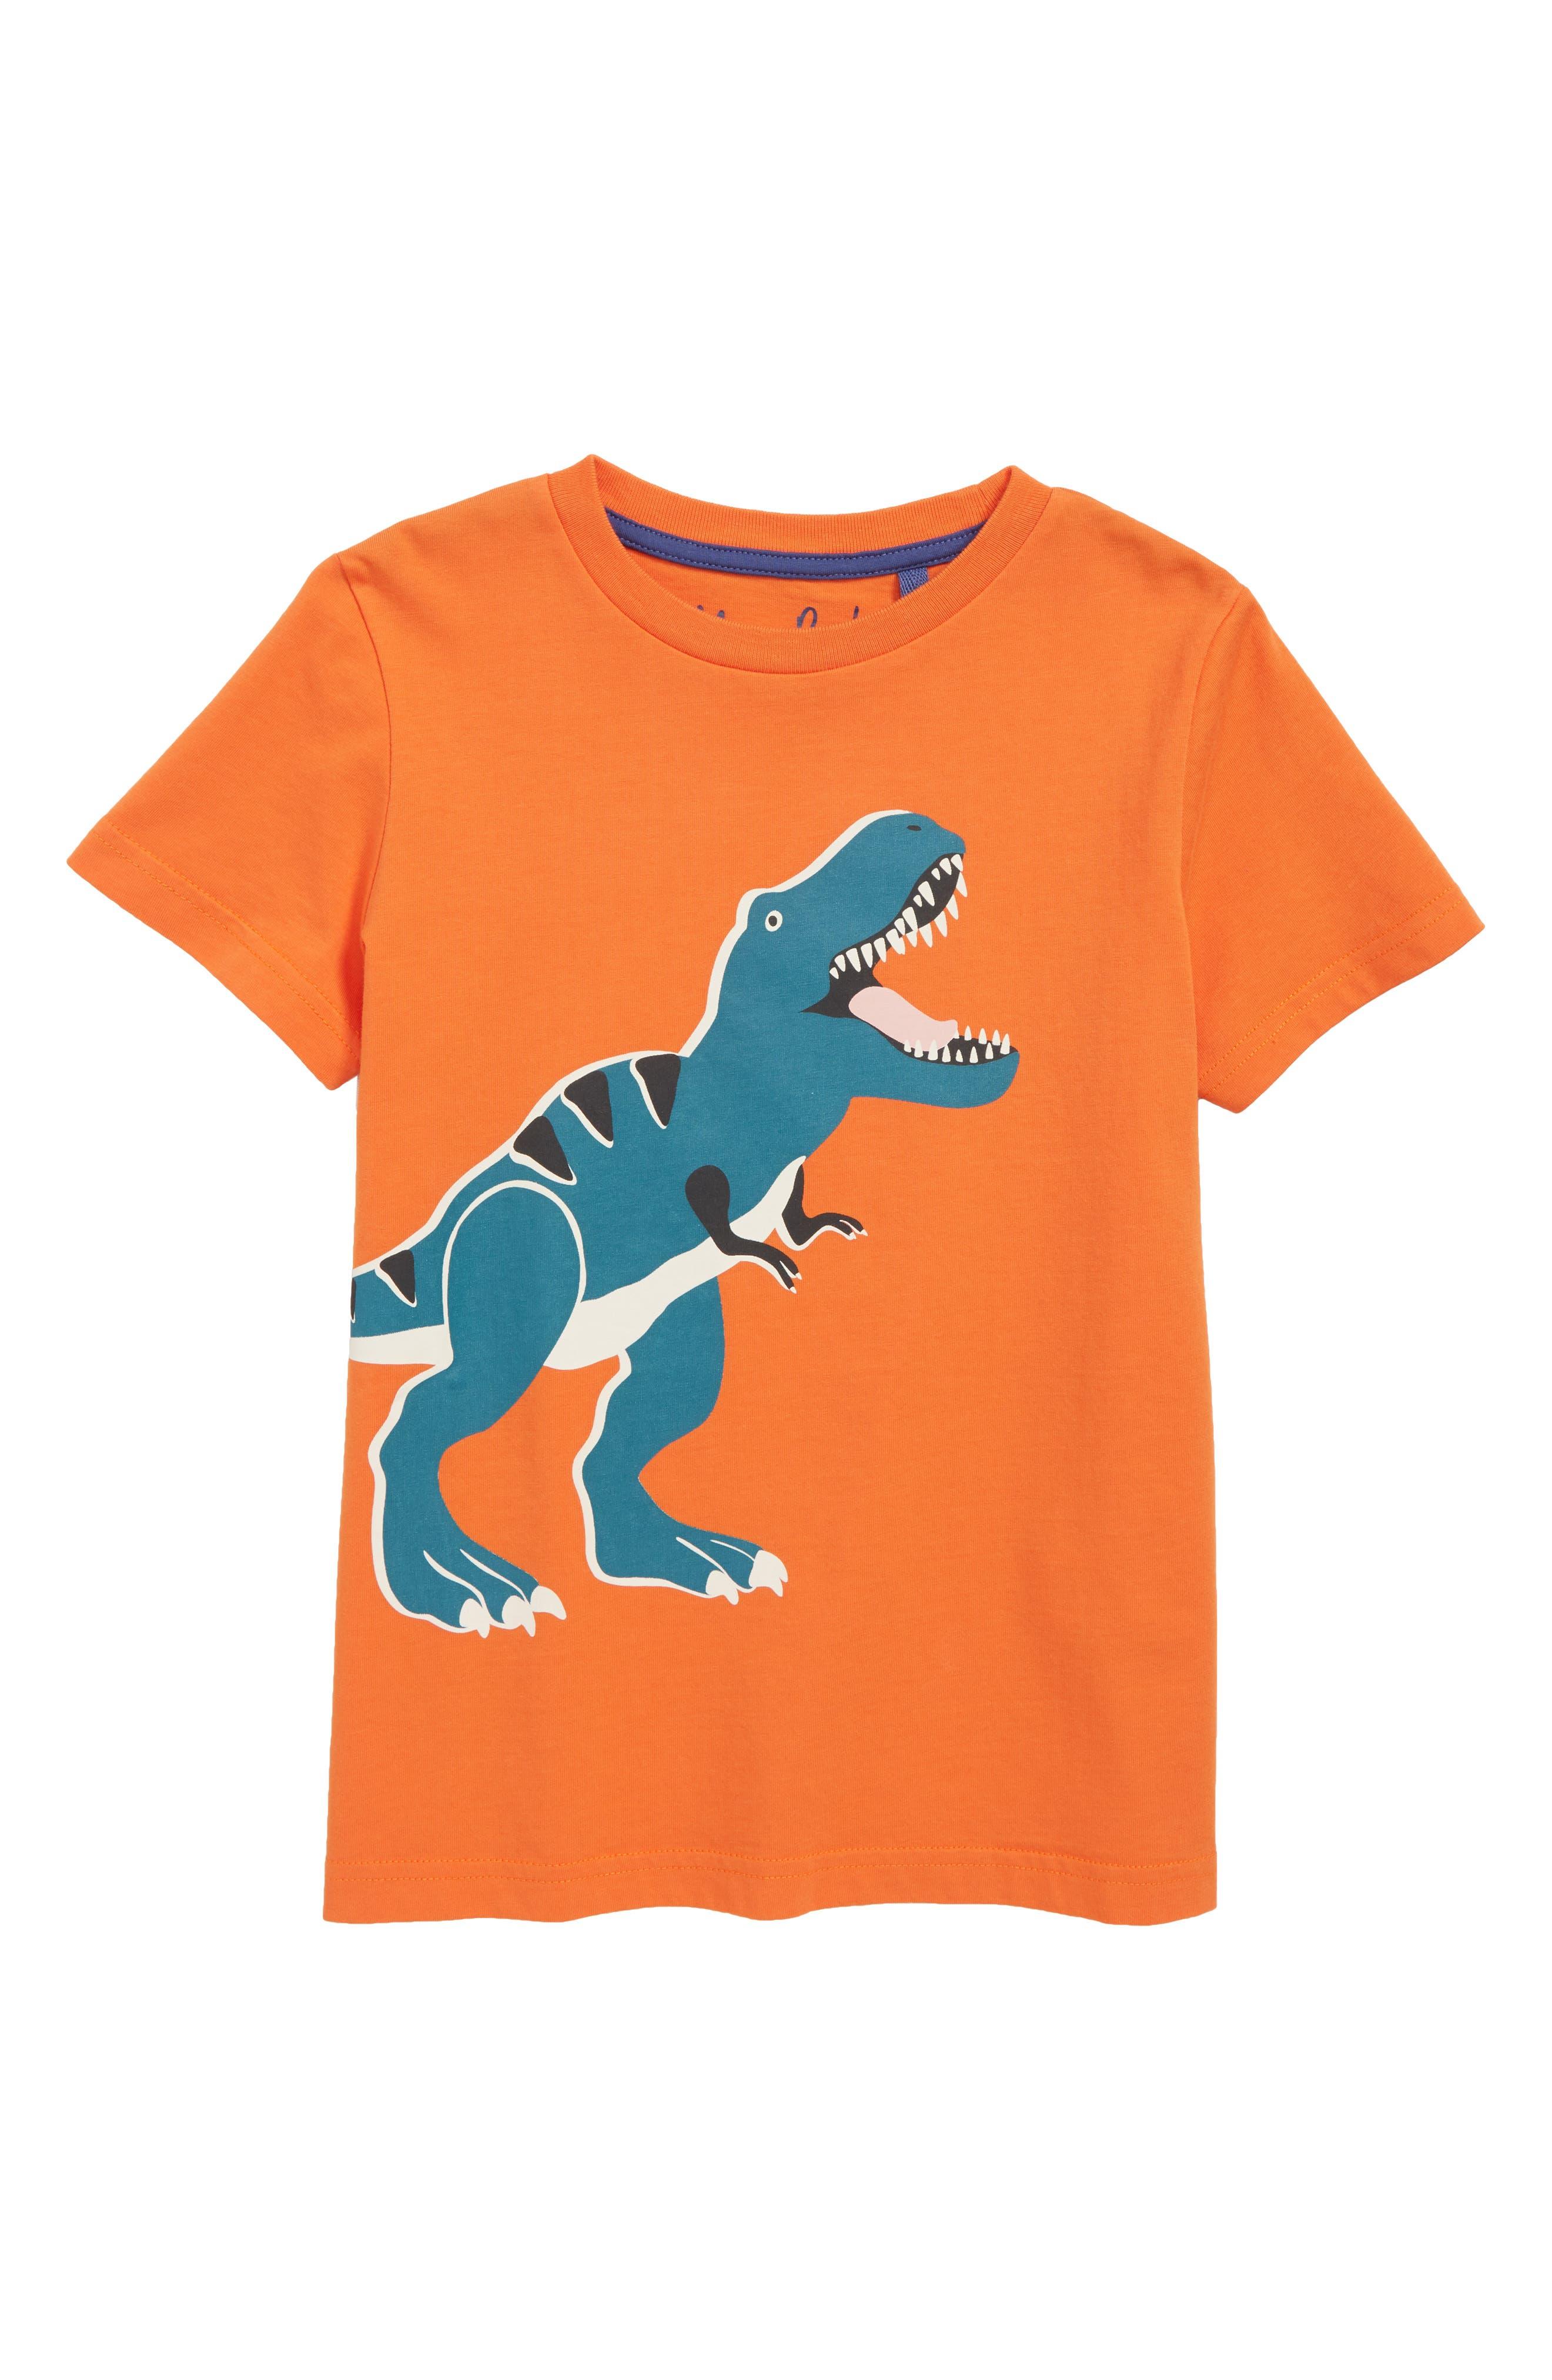 Glow in the Dark T-Rex T-Shirt,                             Main thumbnail 1, color,                             MANGO FIZZ ORANGE